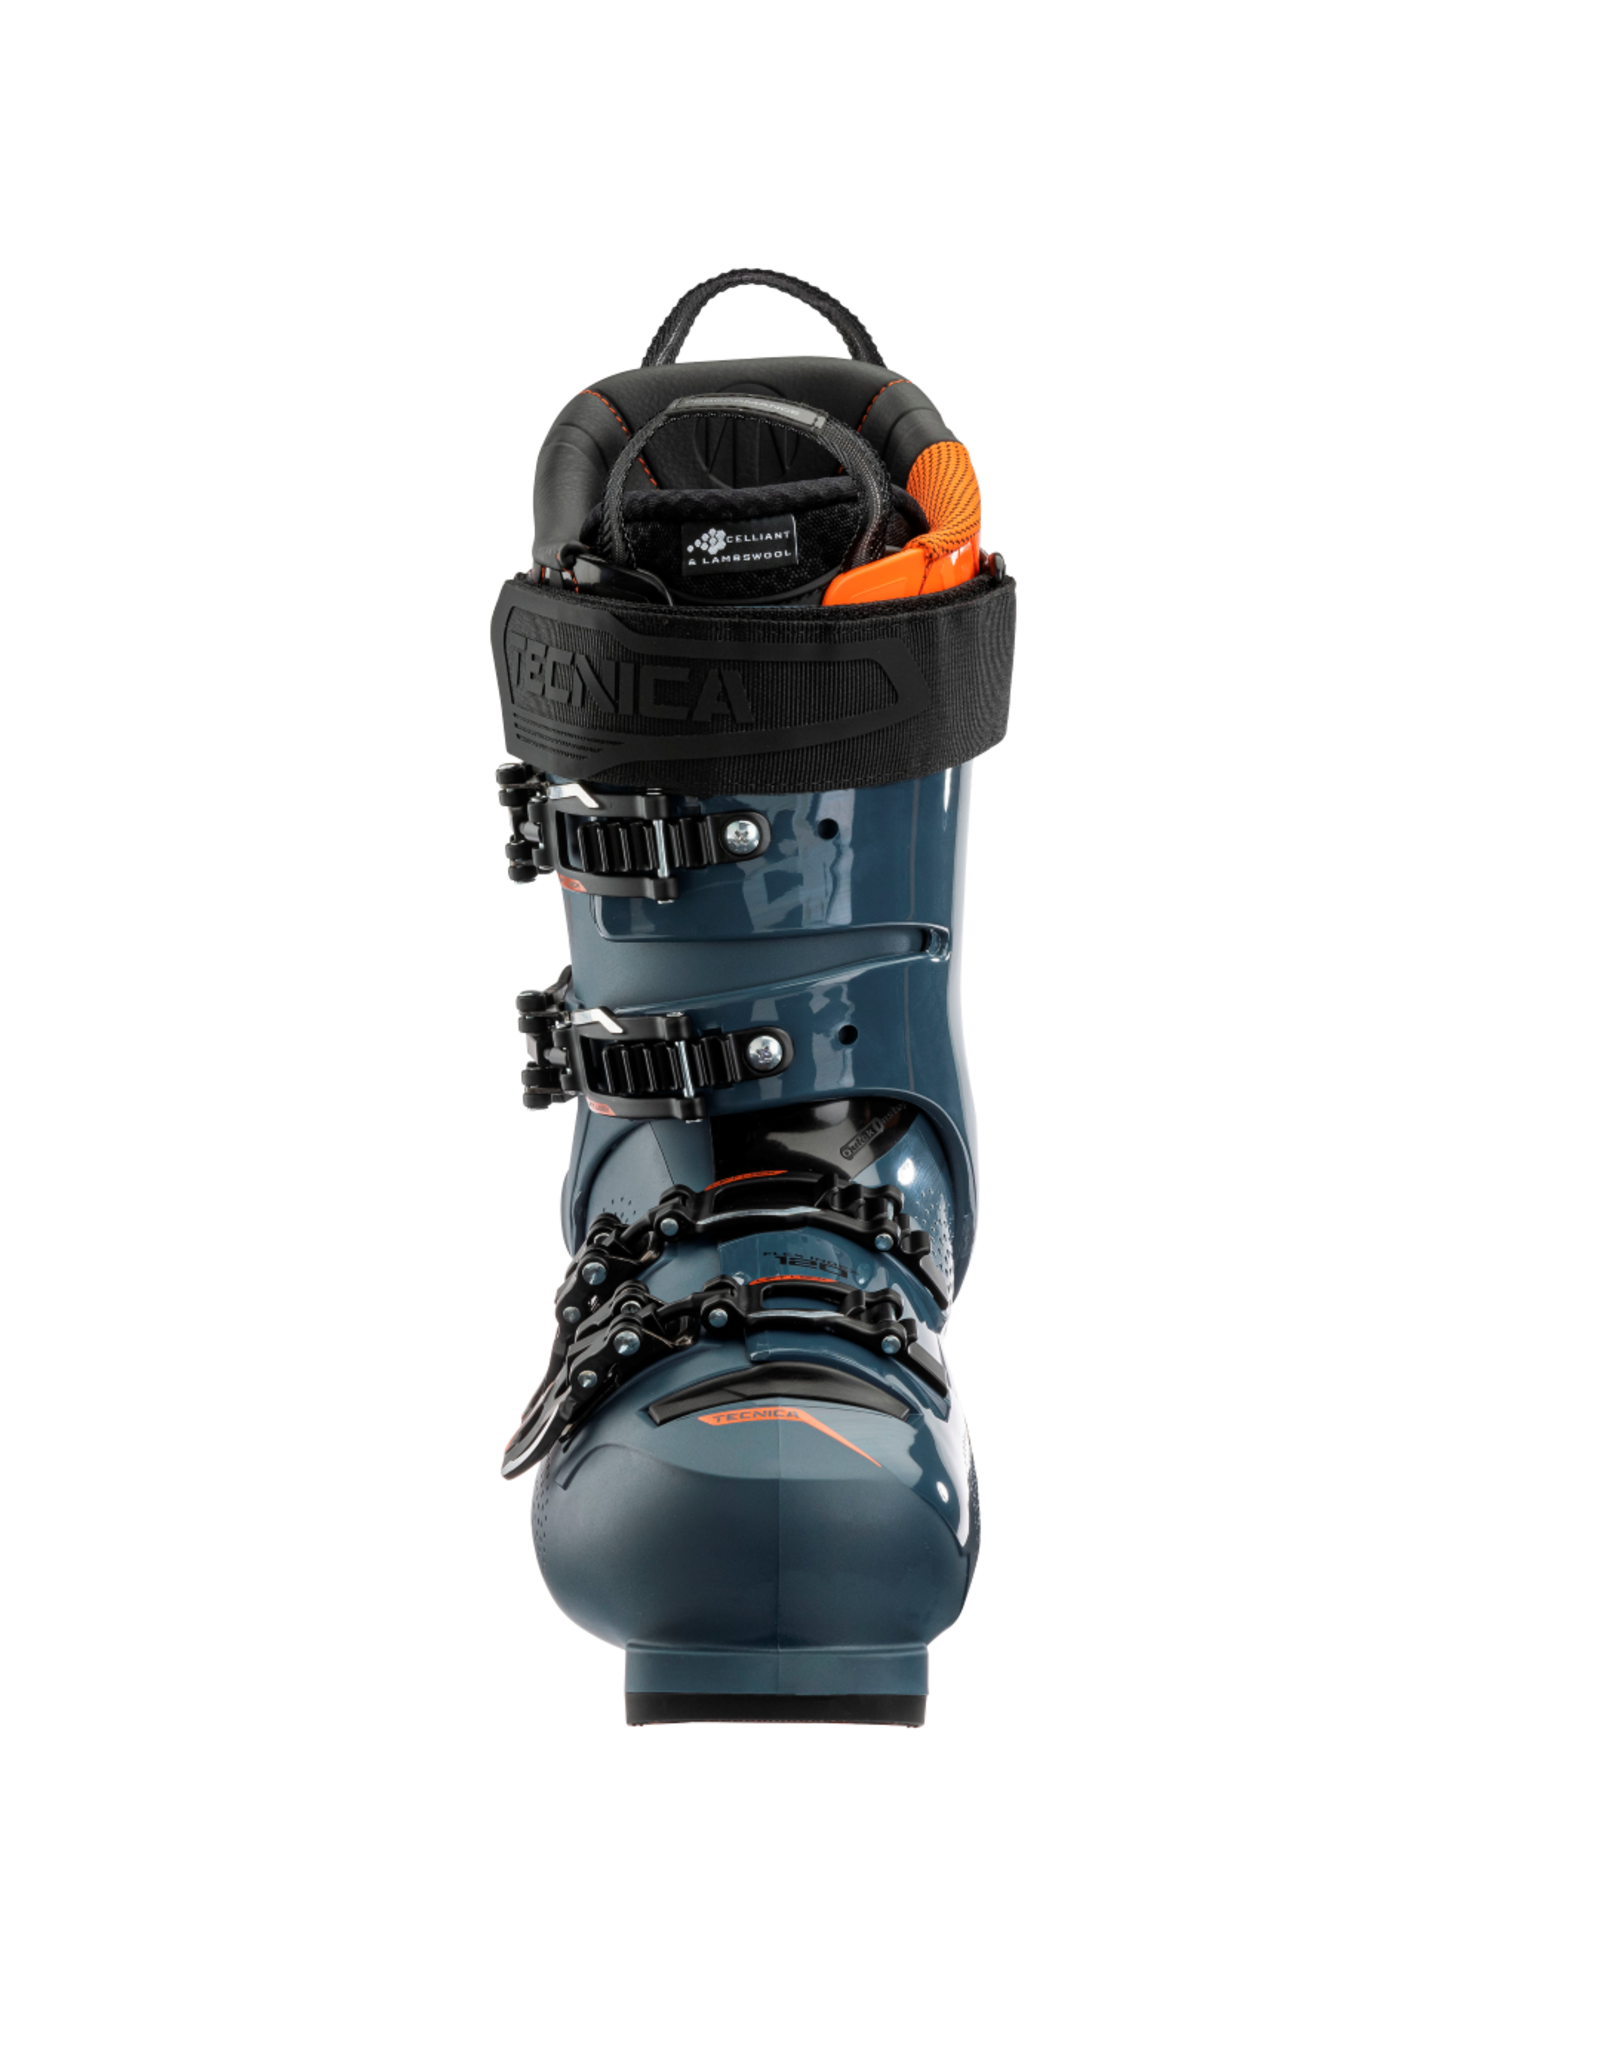 Tecnica Tecnica Mach1 LV 120 Ski Boots - Men